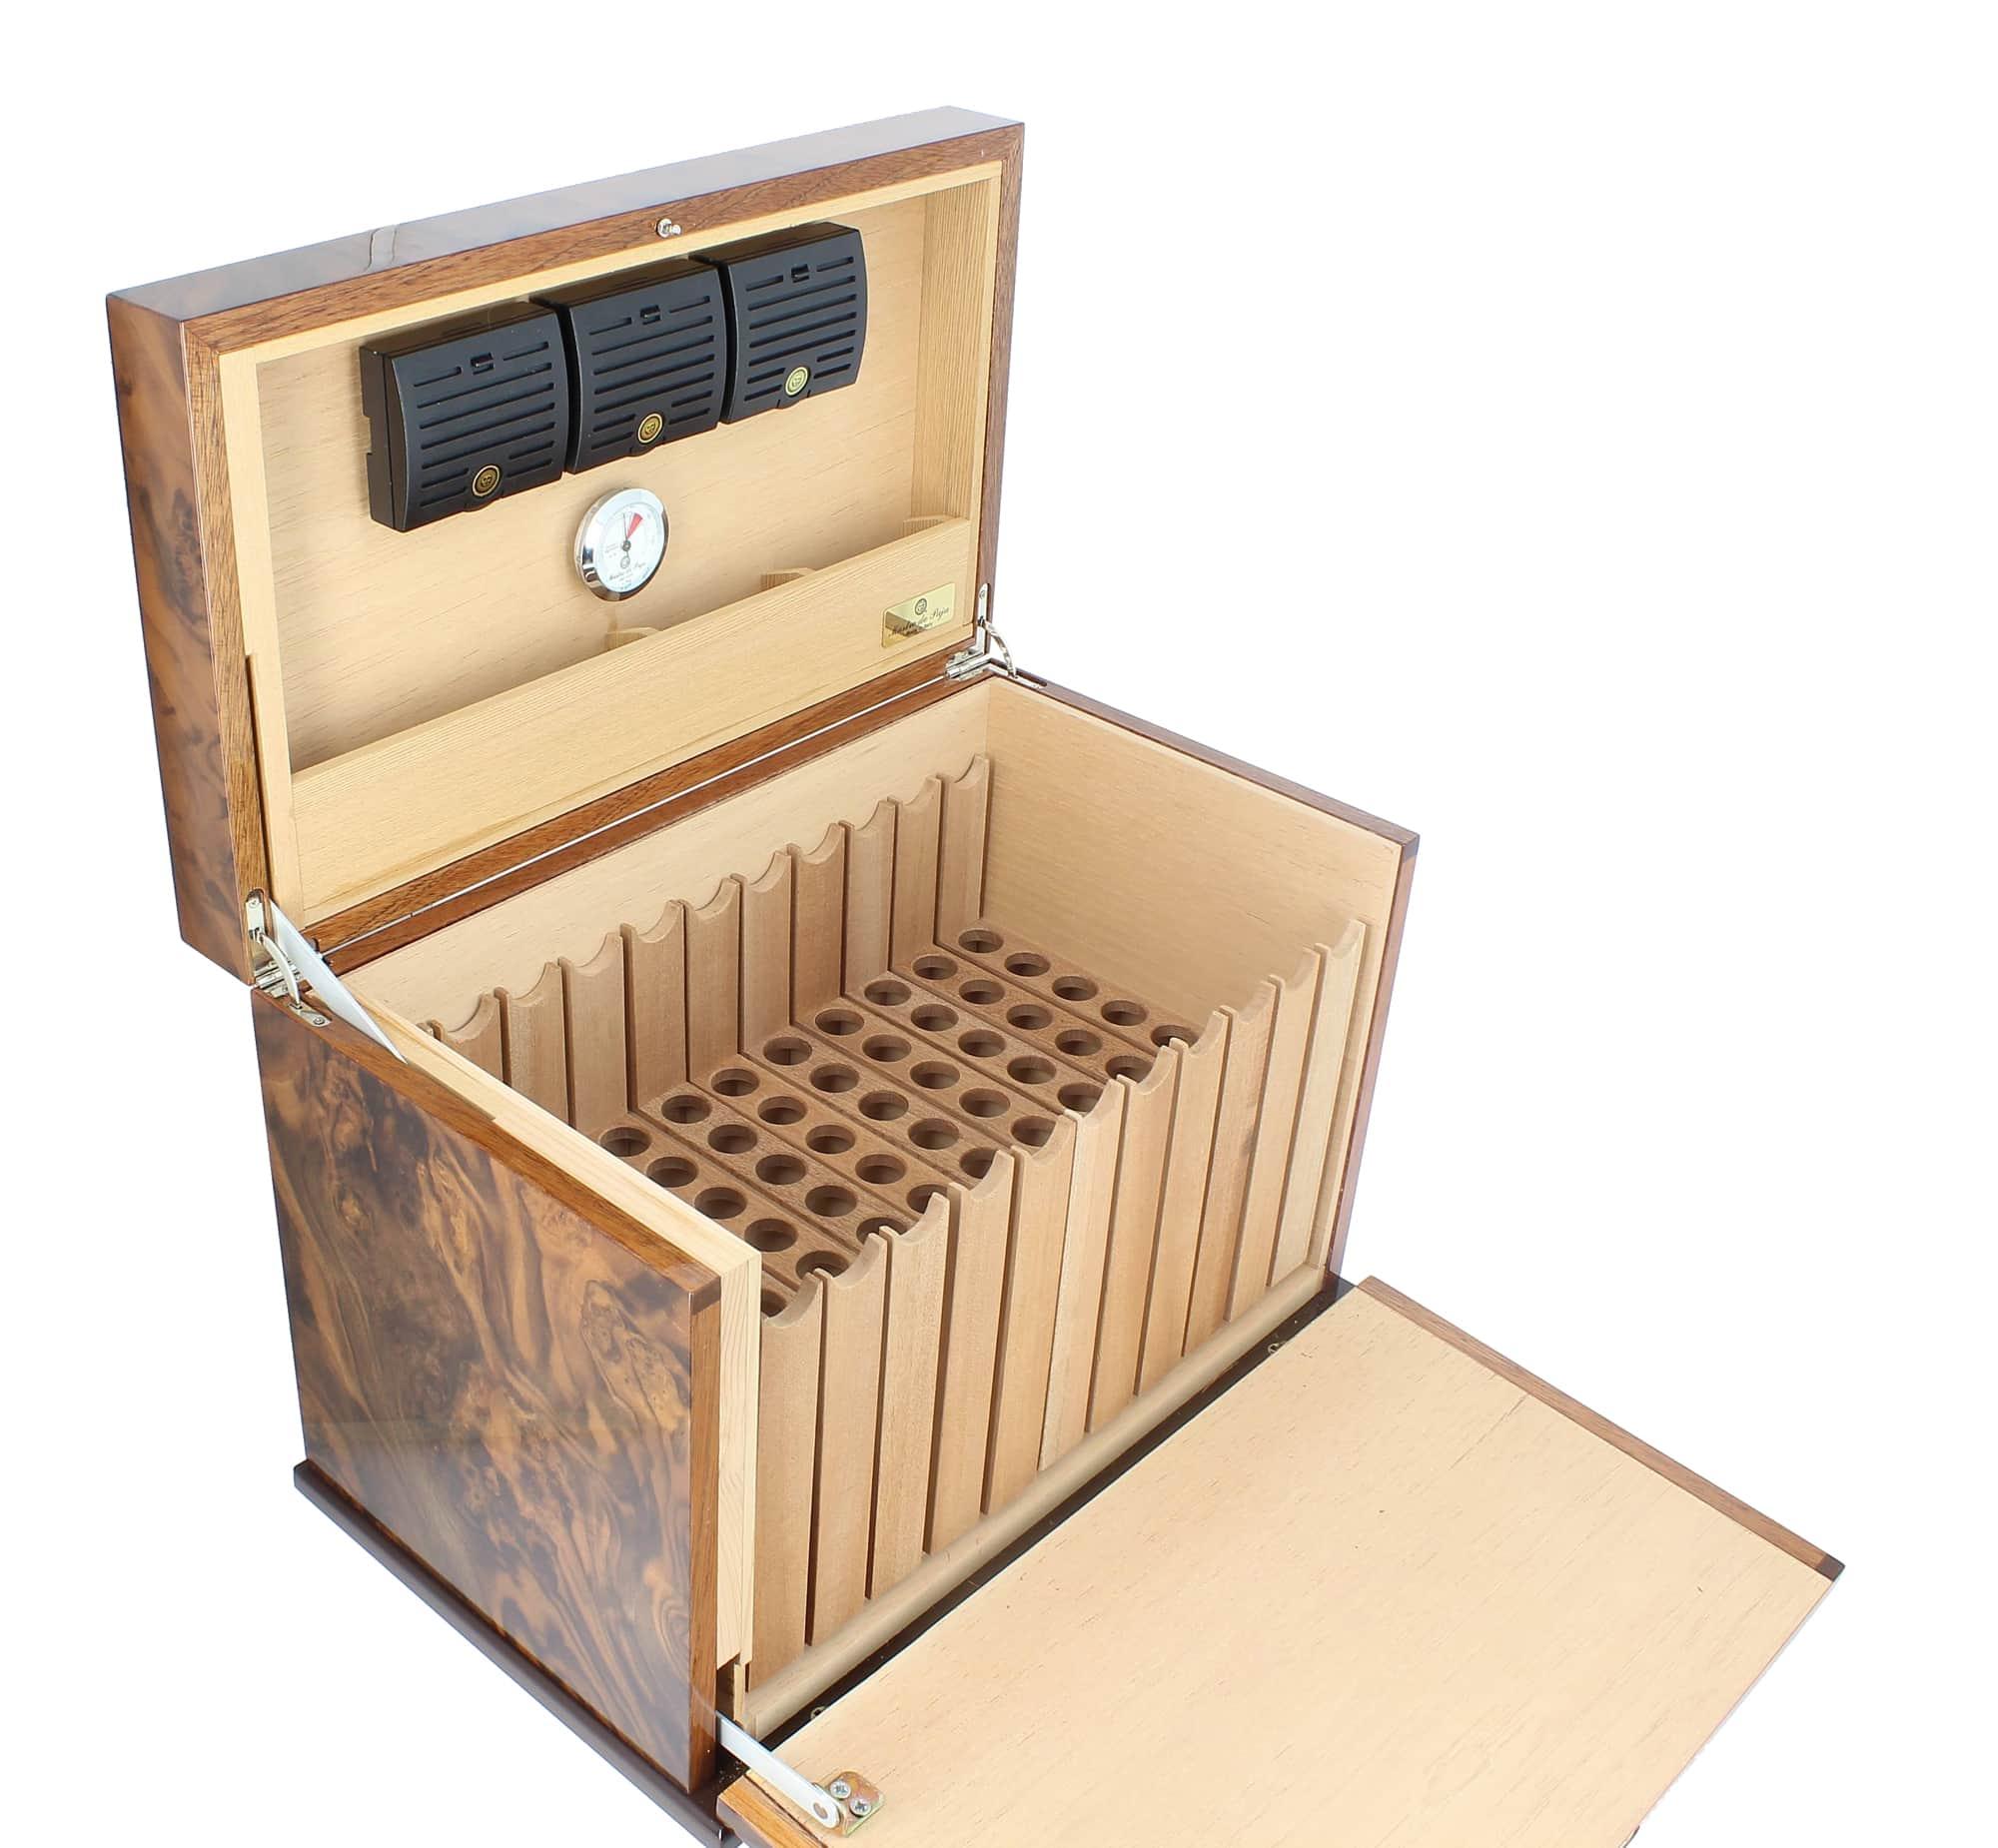 cave cigare les cigares selon edmond degustation. Black Bedroom Furniture Sets. Home Design Ideas